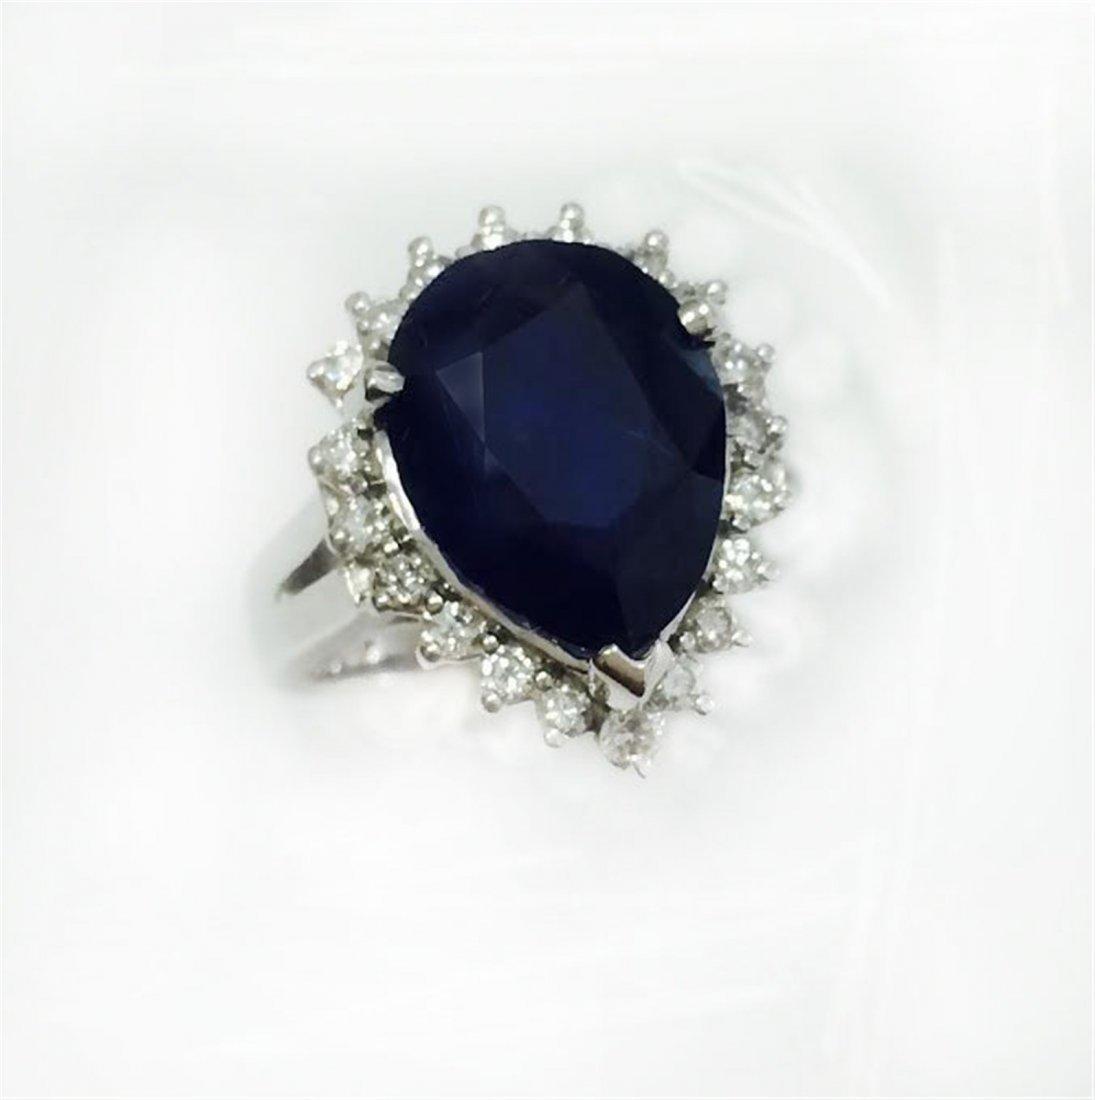 BLUE SAPPHIRE PEAR 7.84CT, GLS 9187  14K W/G RING